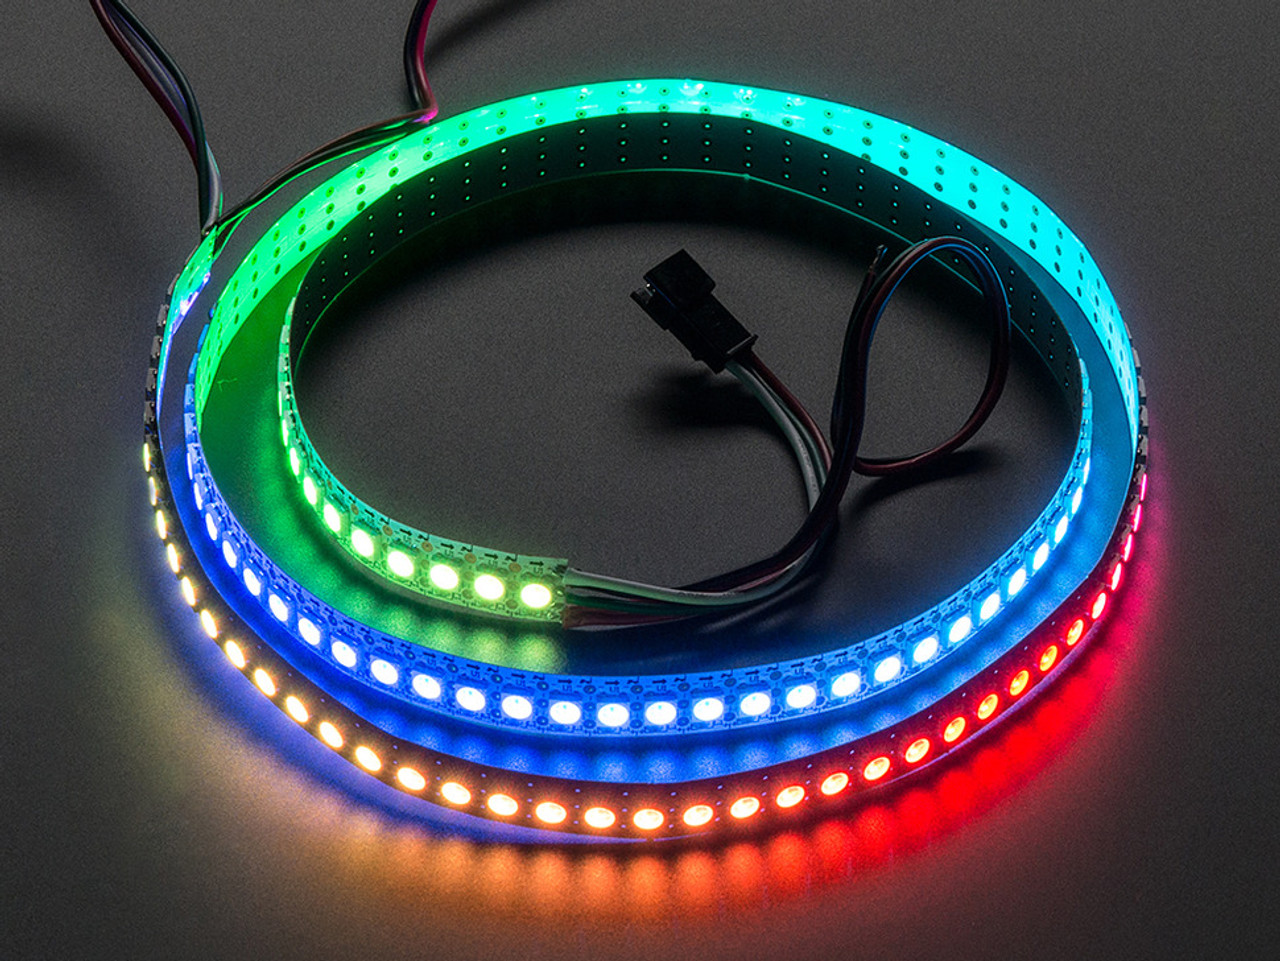 Adafruit NeoPixel Digital RGB LED Strip 144 LED - 1m White